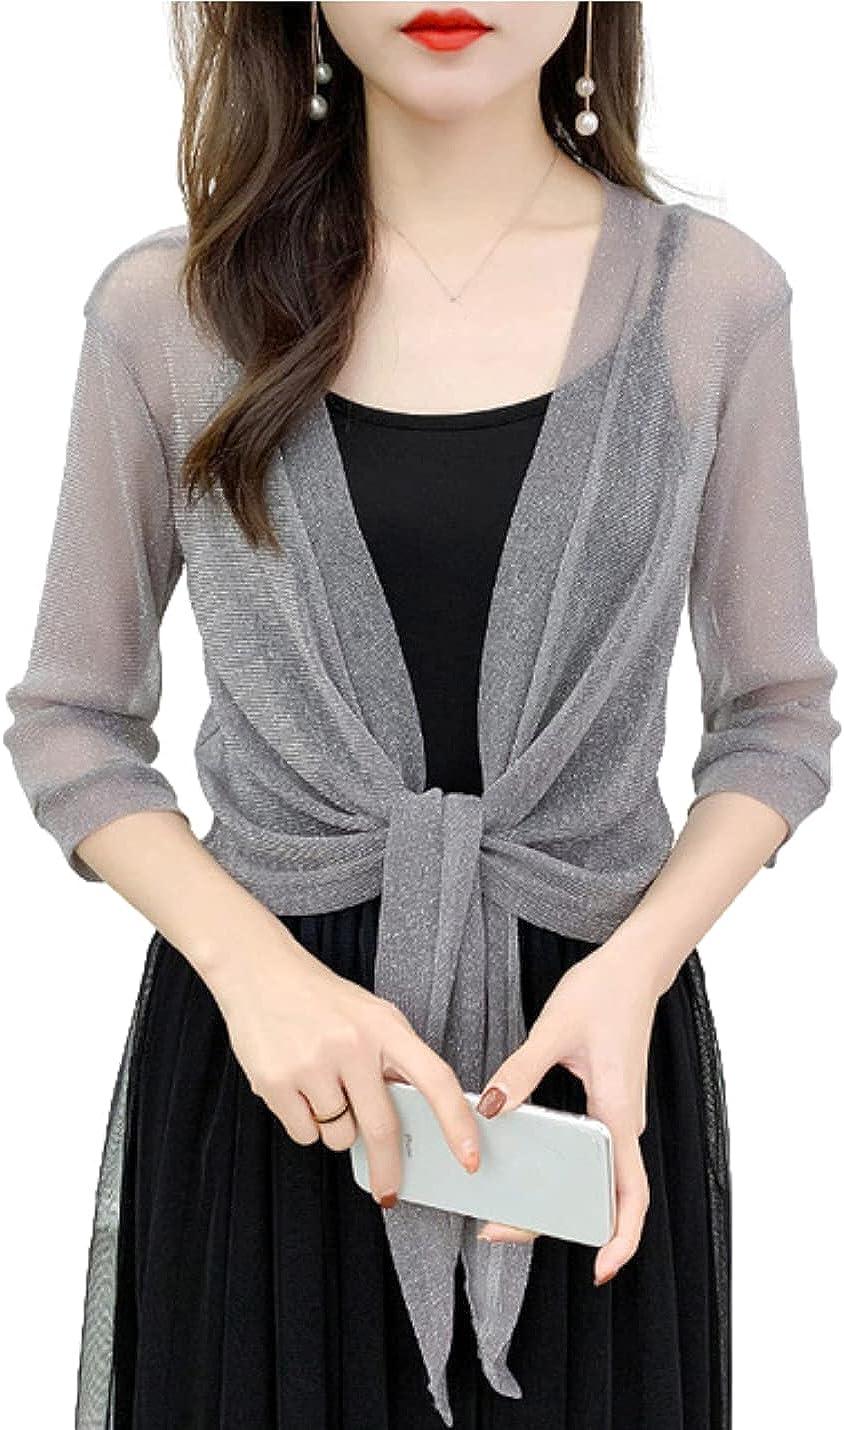 Bnigung Women's Lace Cardigan 3/4 Sleeve Shrug Tie Front Sheer Bolero Crop Cardigans